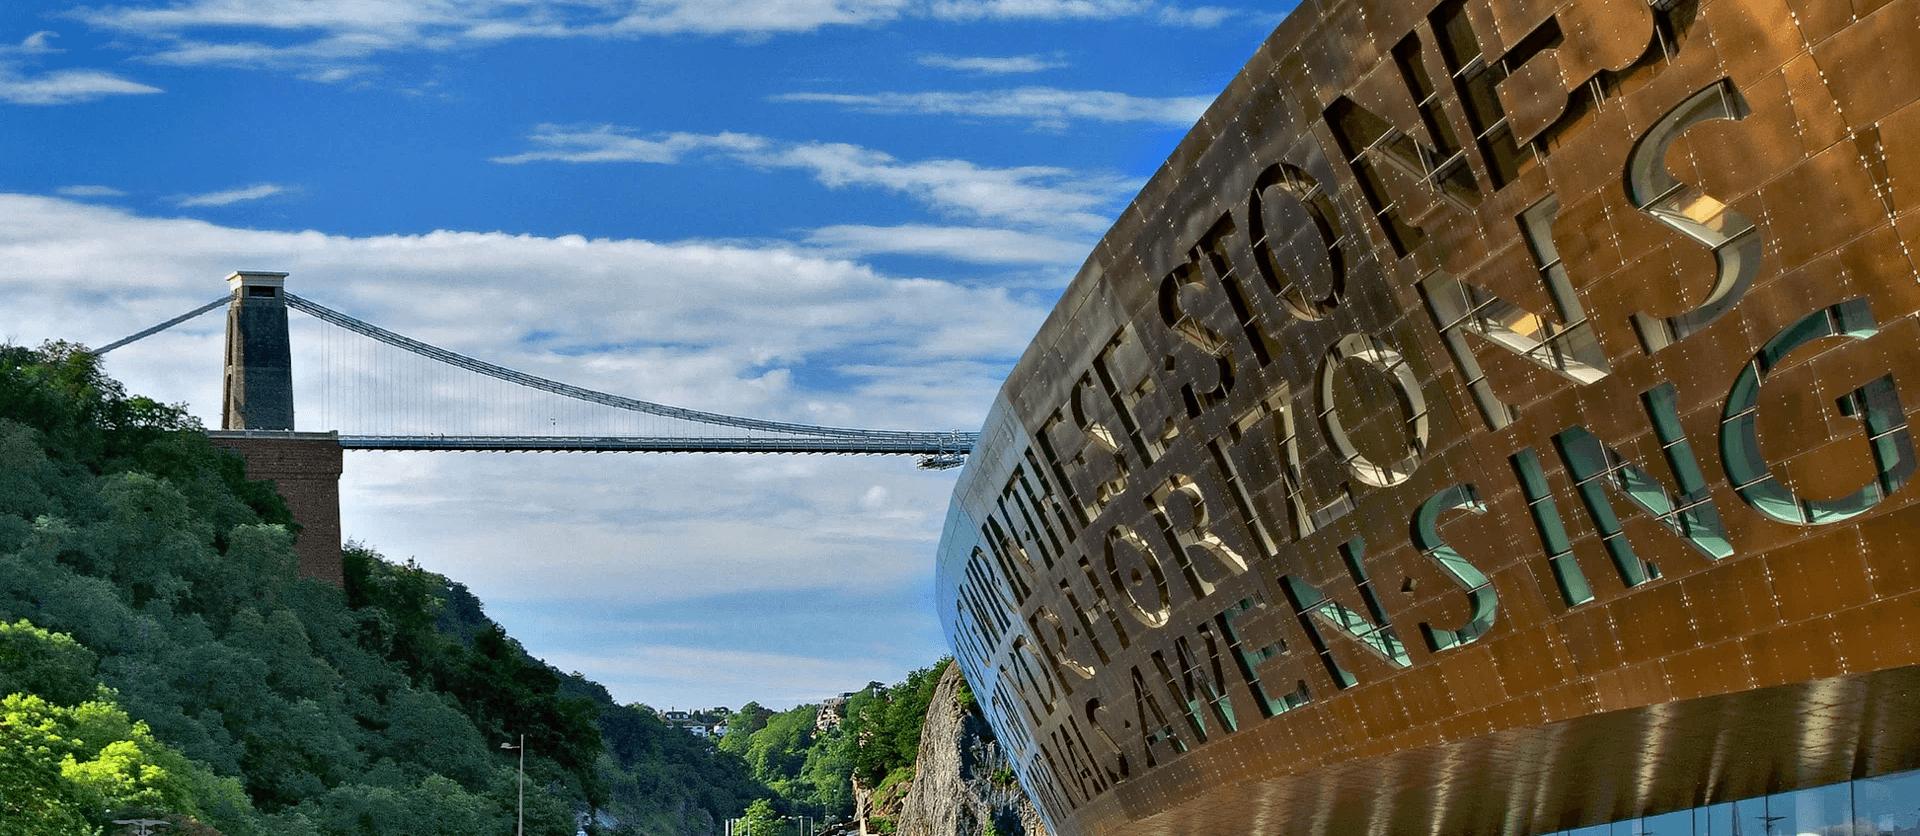 Web Design Bristol & Cardiff